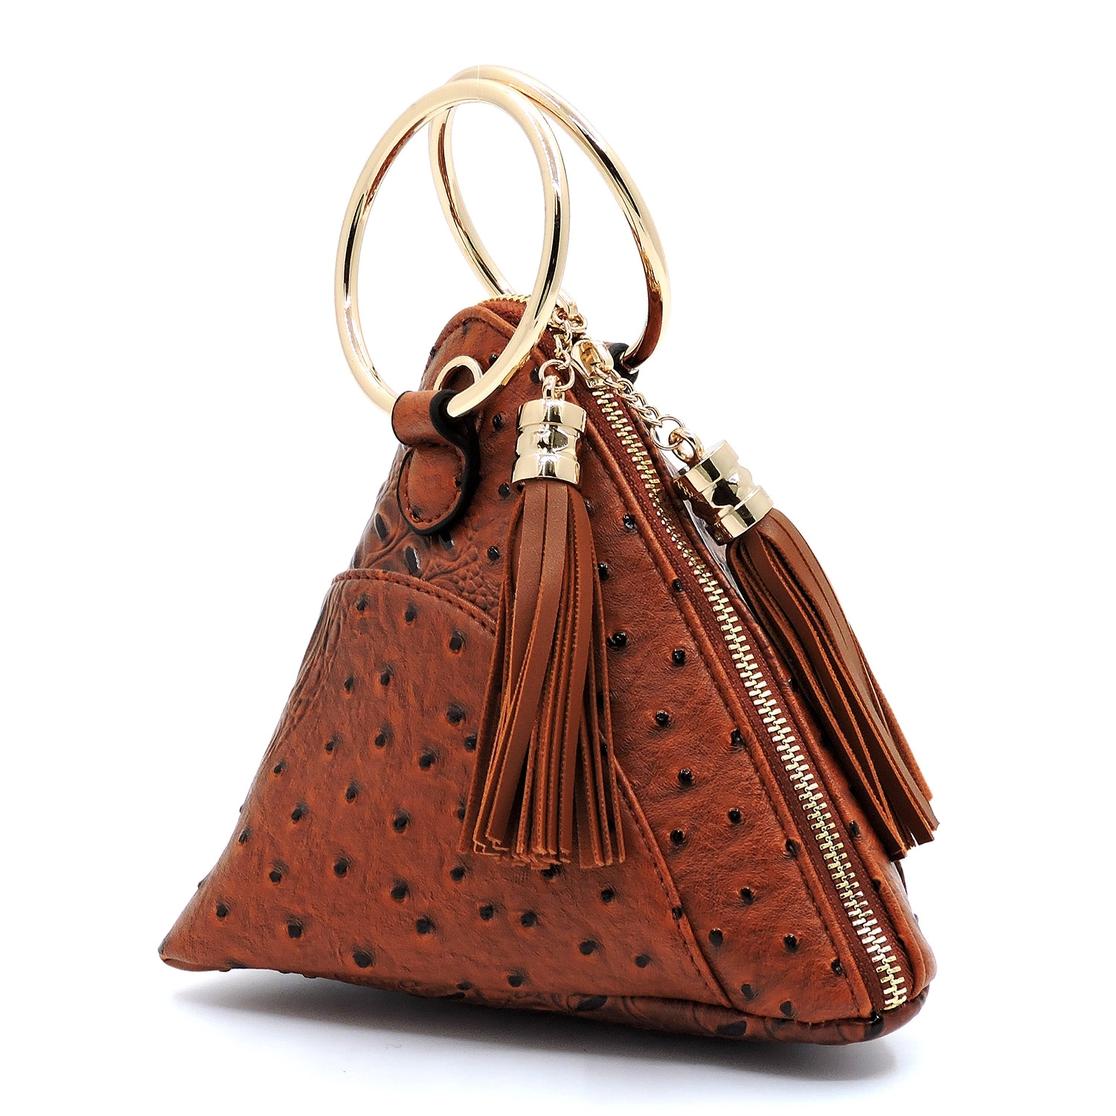 656203d886 FASHION BRIDGE Wholesale Ostrich Croc Clutch Crossbody Bag ...